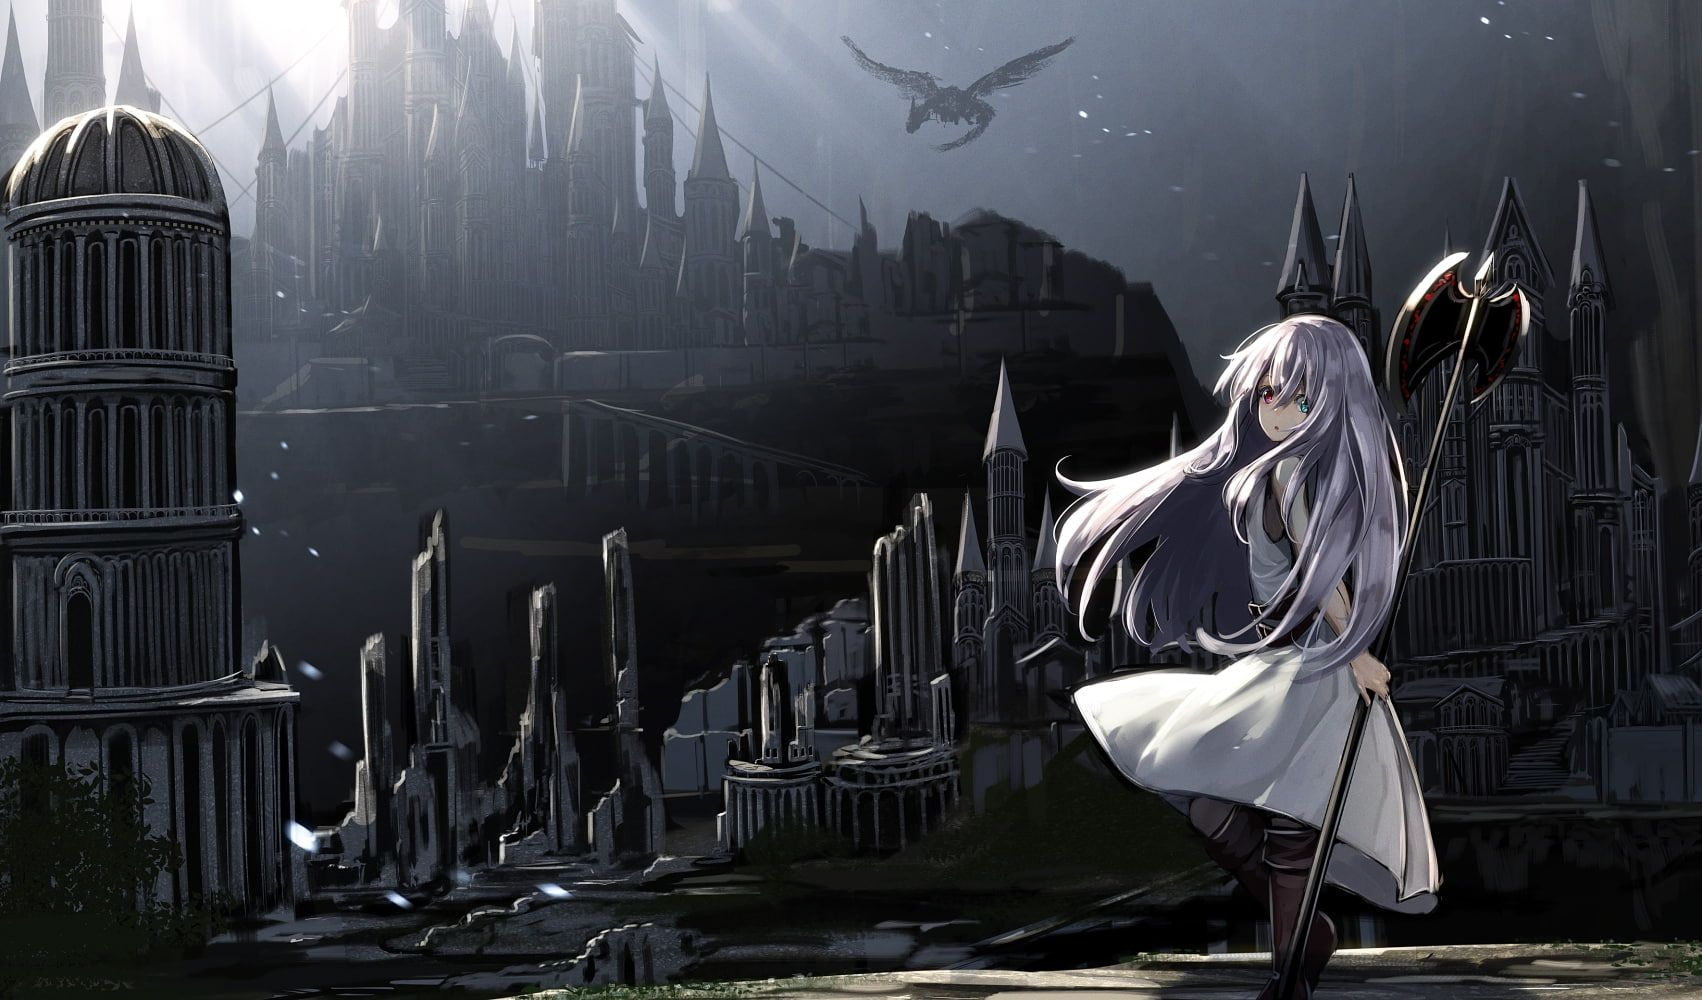 Anime Characters Outline Black Wallpaper Anime Wallpaper Download Dark Anime Android Wallpaper Anime